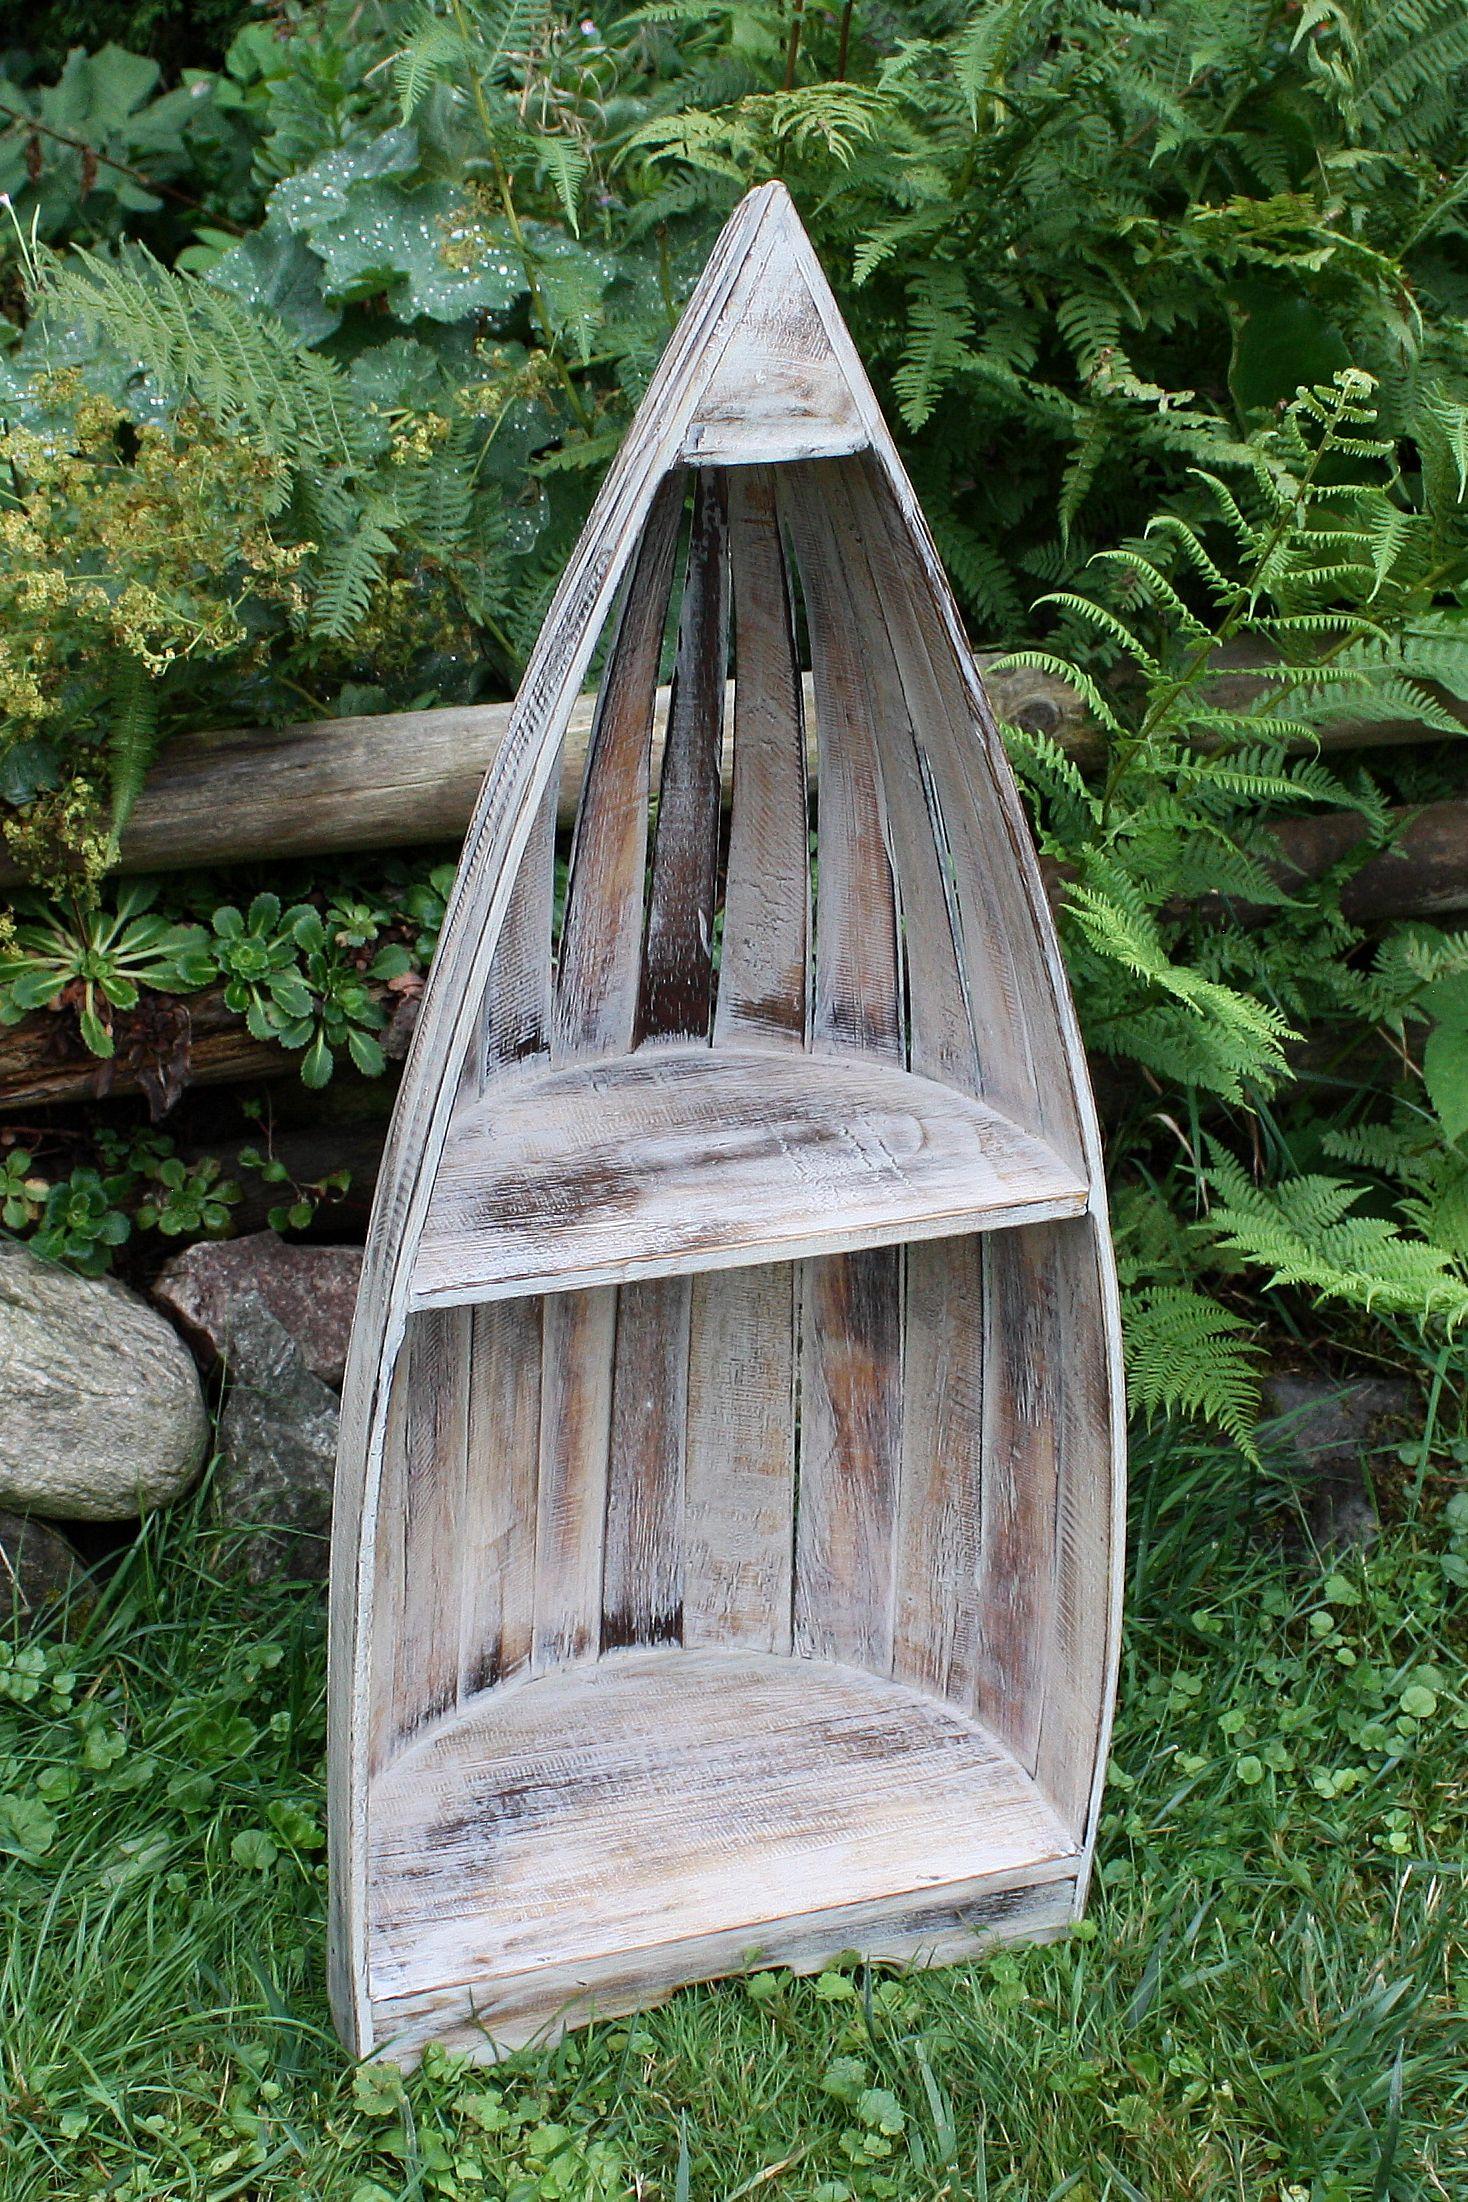 dschungel shop schiffsregal maritimes regal aus holz. Black Bedroom Furniture Sets. Home Design Ideas